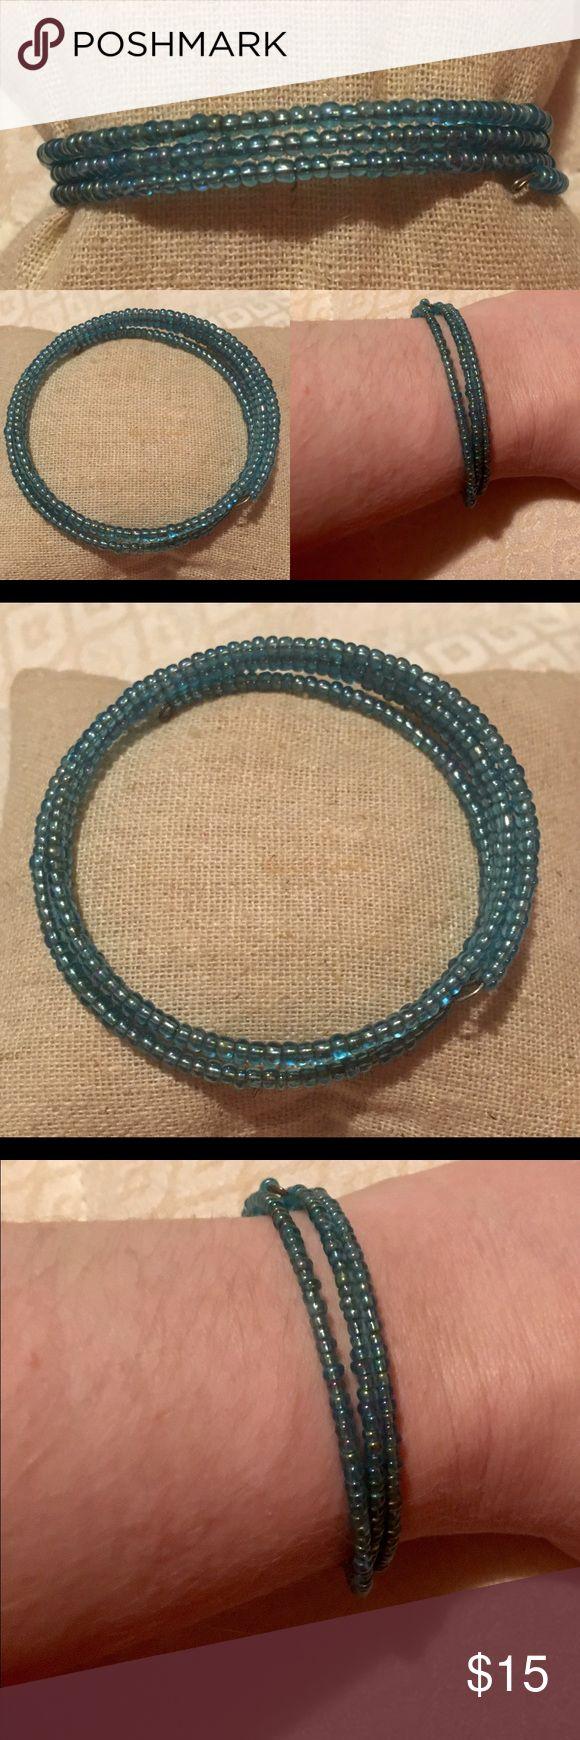 3 strand wrap bracelet Adjusts to fit most sized wrists Accessories Jewelry